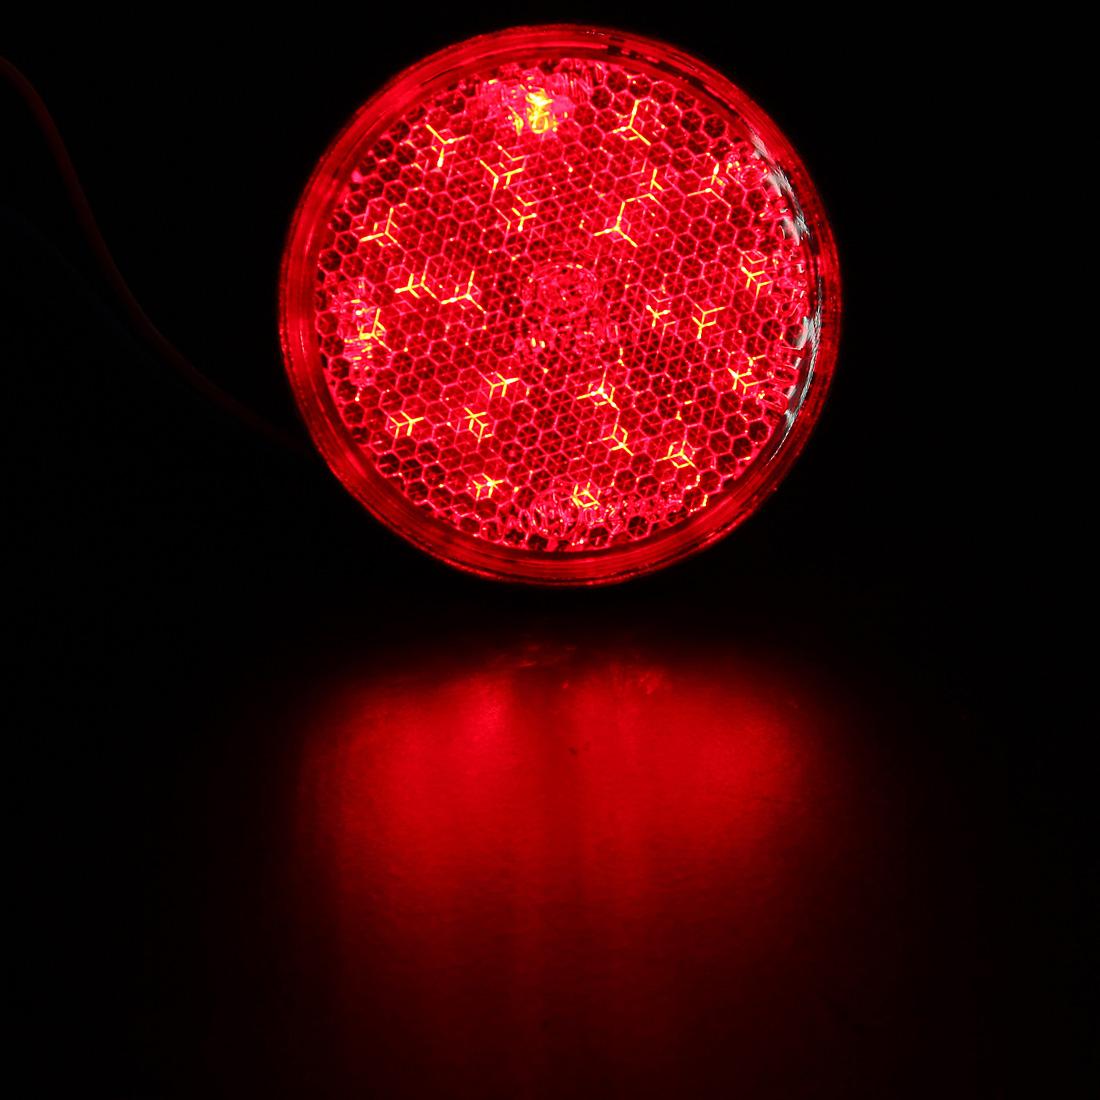 12v led r flecteur rouge jaune blanc feu arri re lumi re 3c rm02 camion remorque ebay. Black Bedroom Furniture Sets. Home Design Ideas